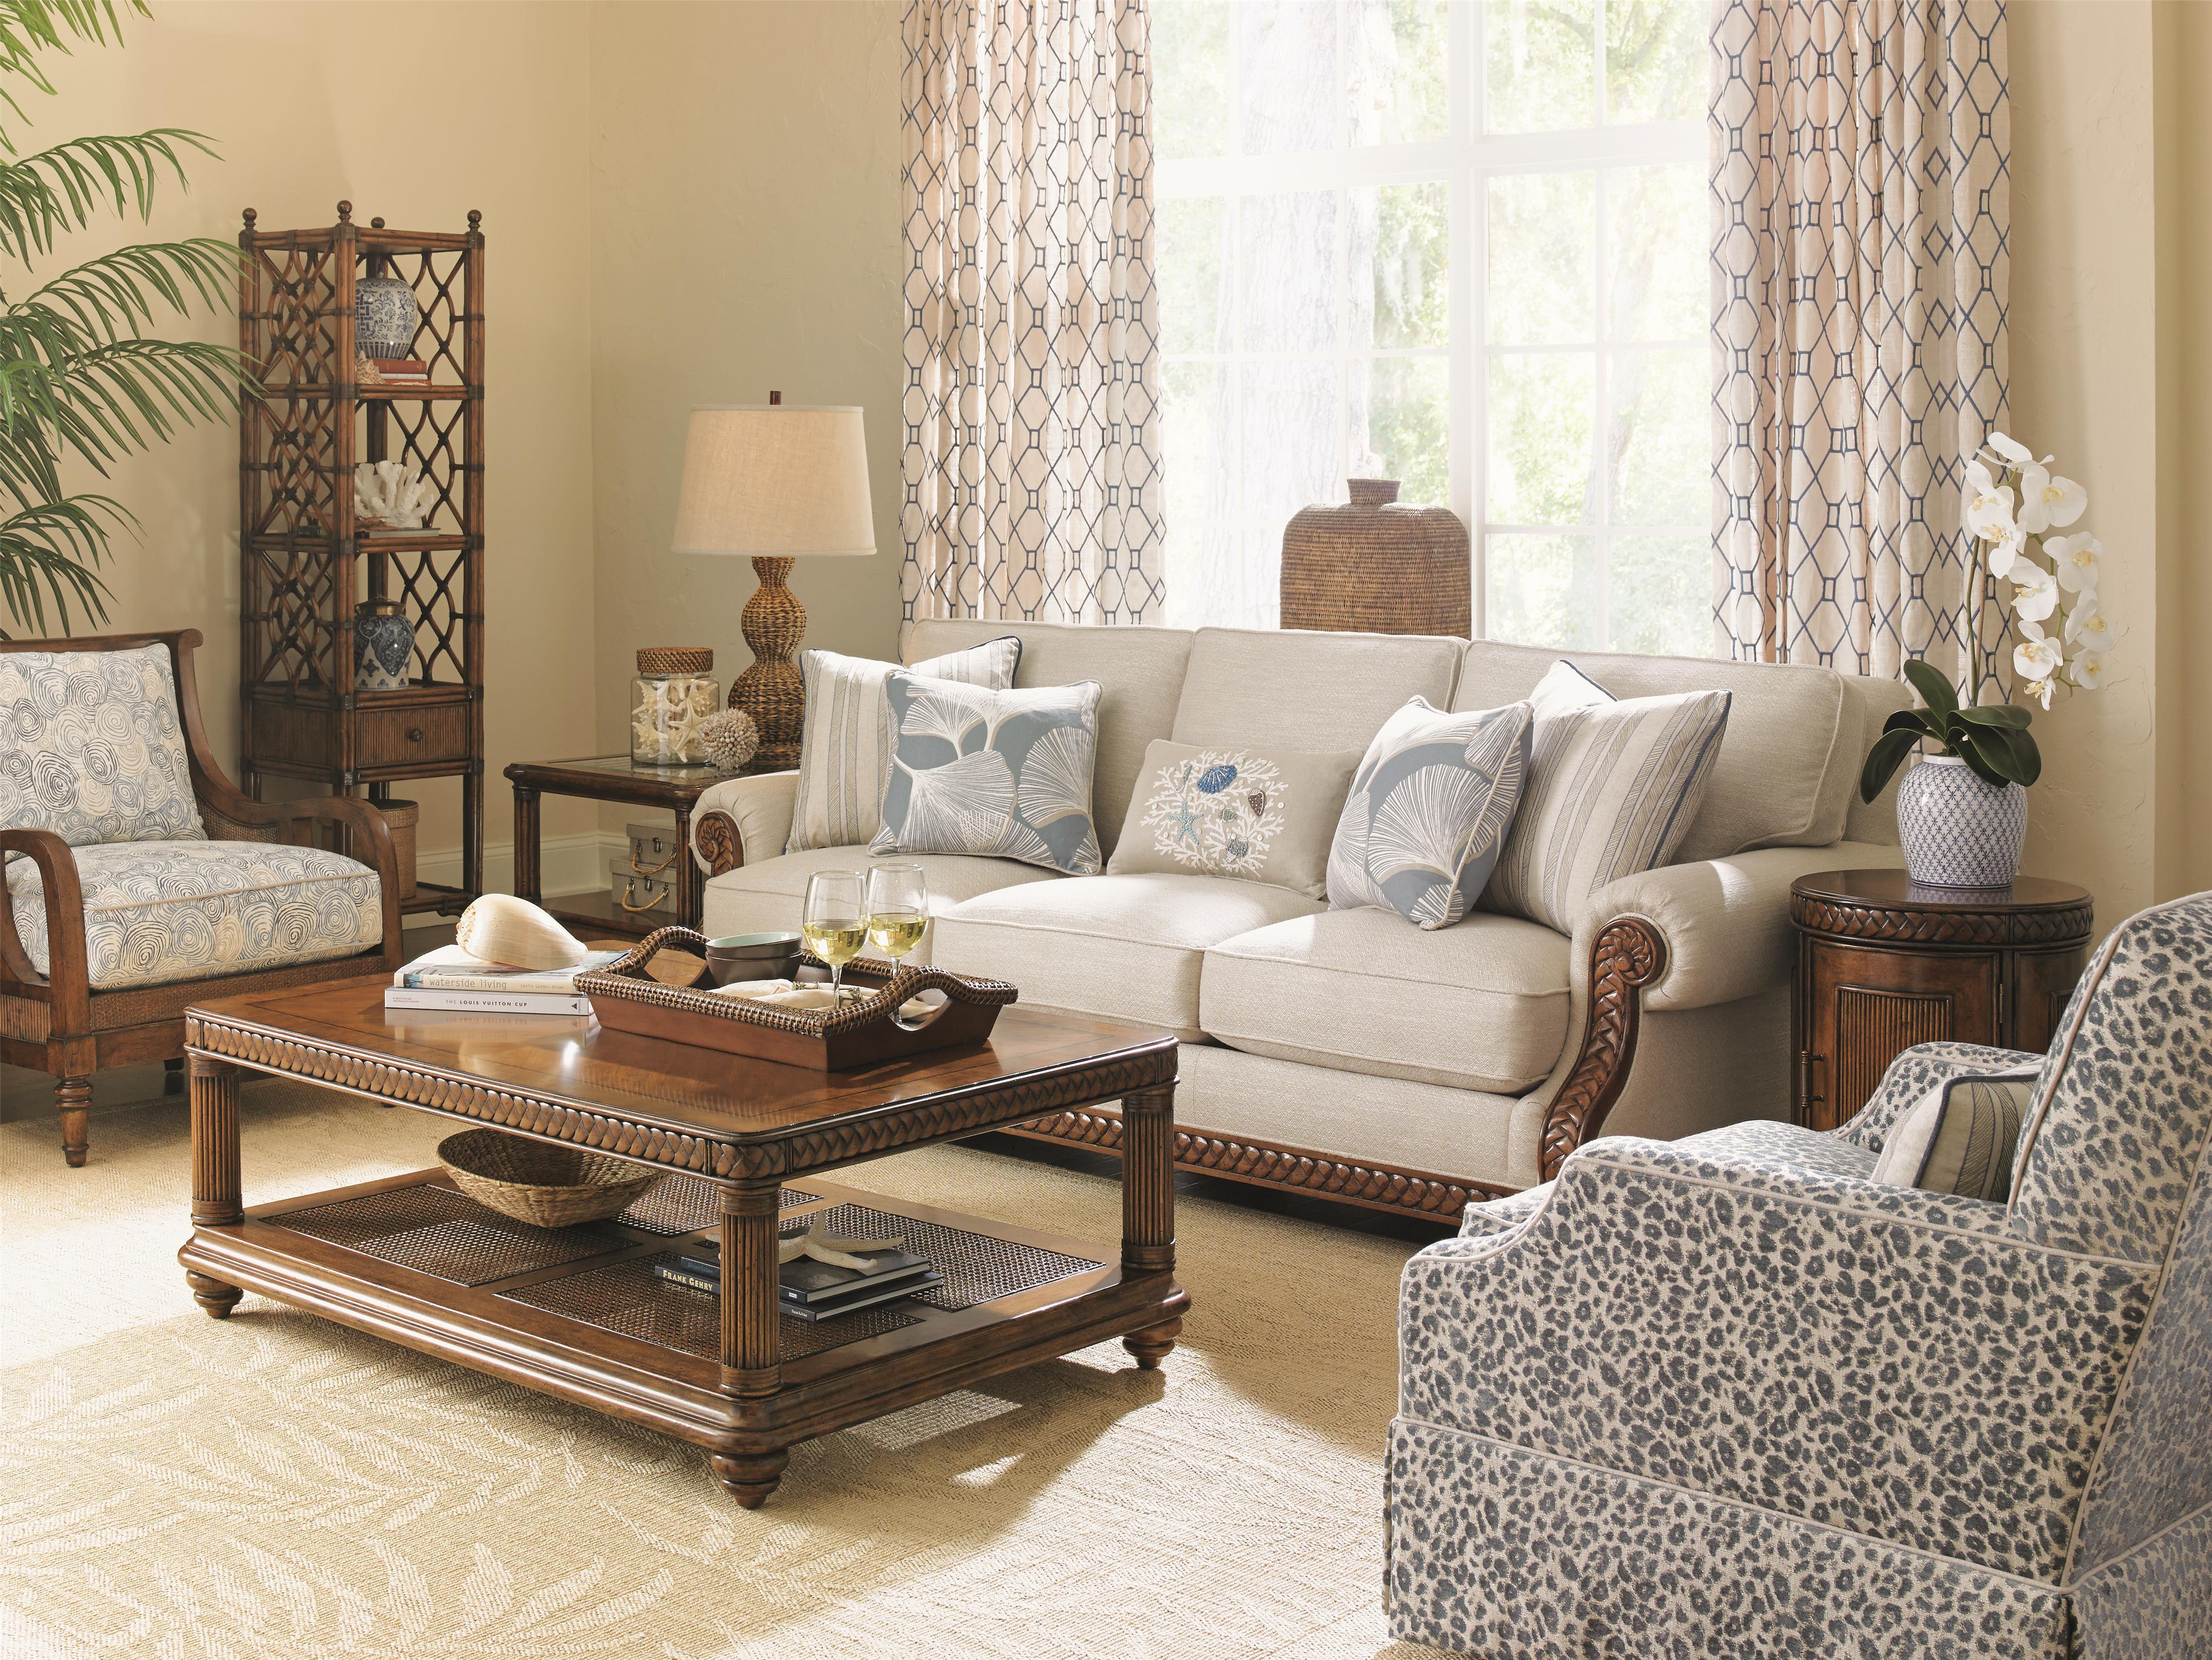 tommy bahama home bali hai stationary living room group hudson 39 s furniture stationary living. Black Bedroom Furniture Sets. Home Design Ideas